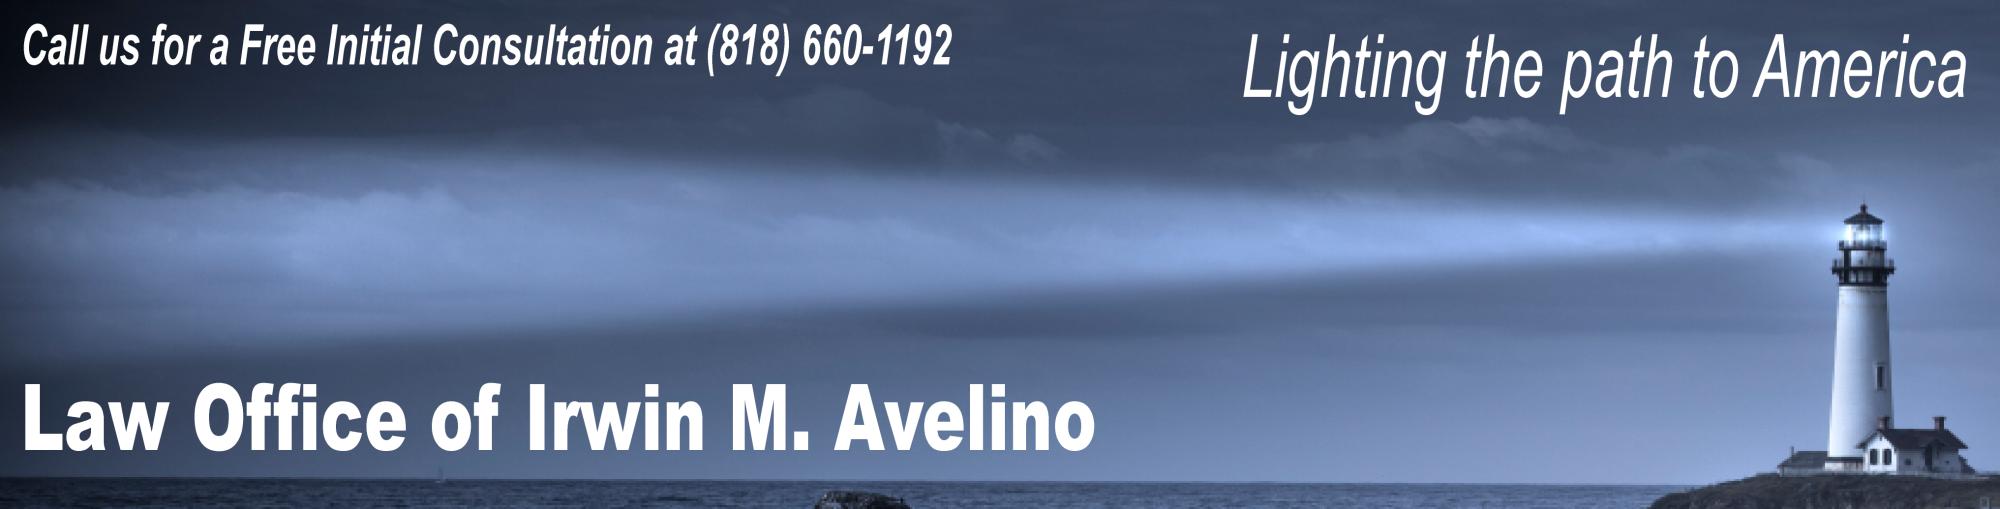 Law Office of Irwin M. Avelino